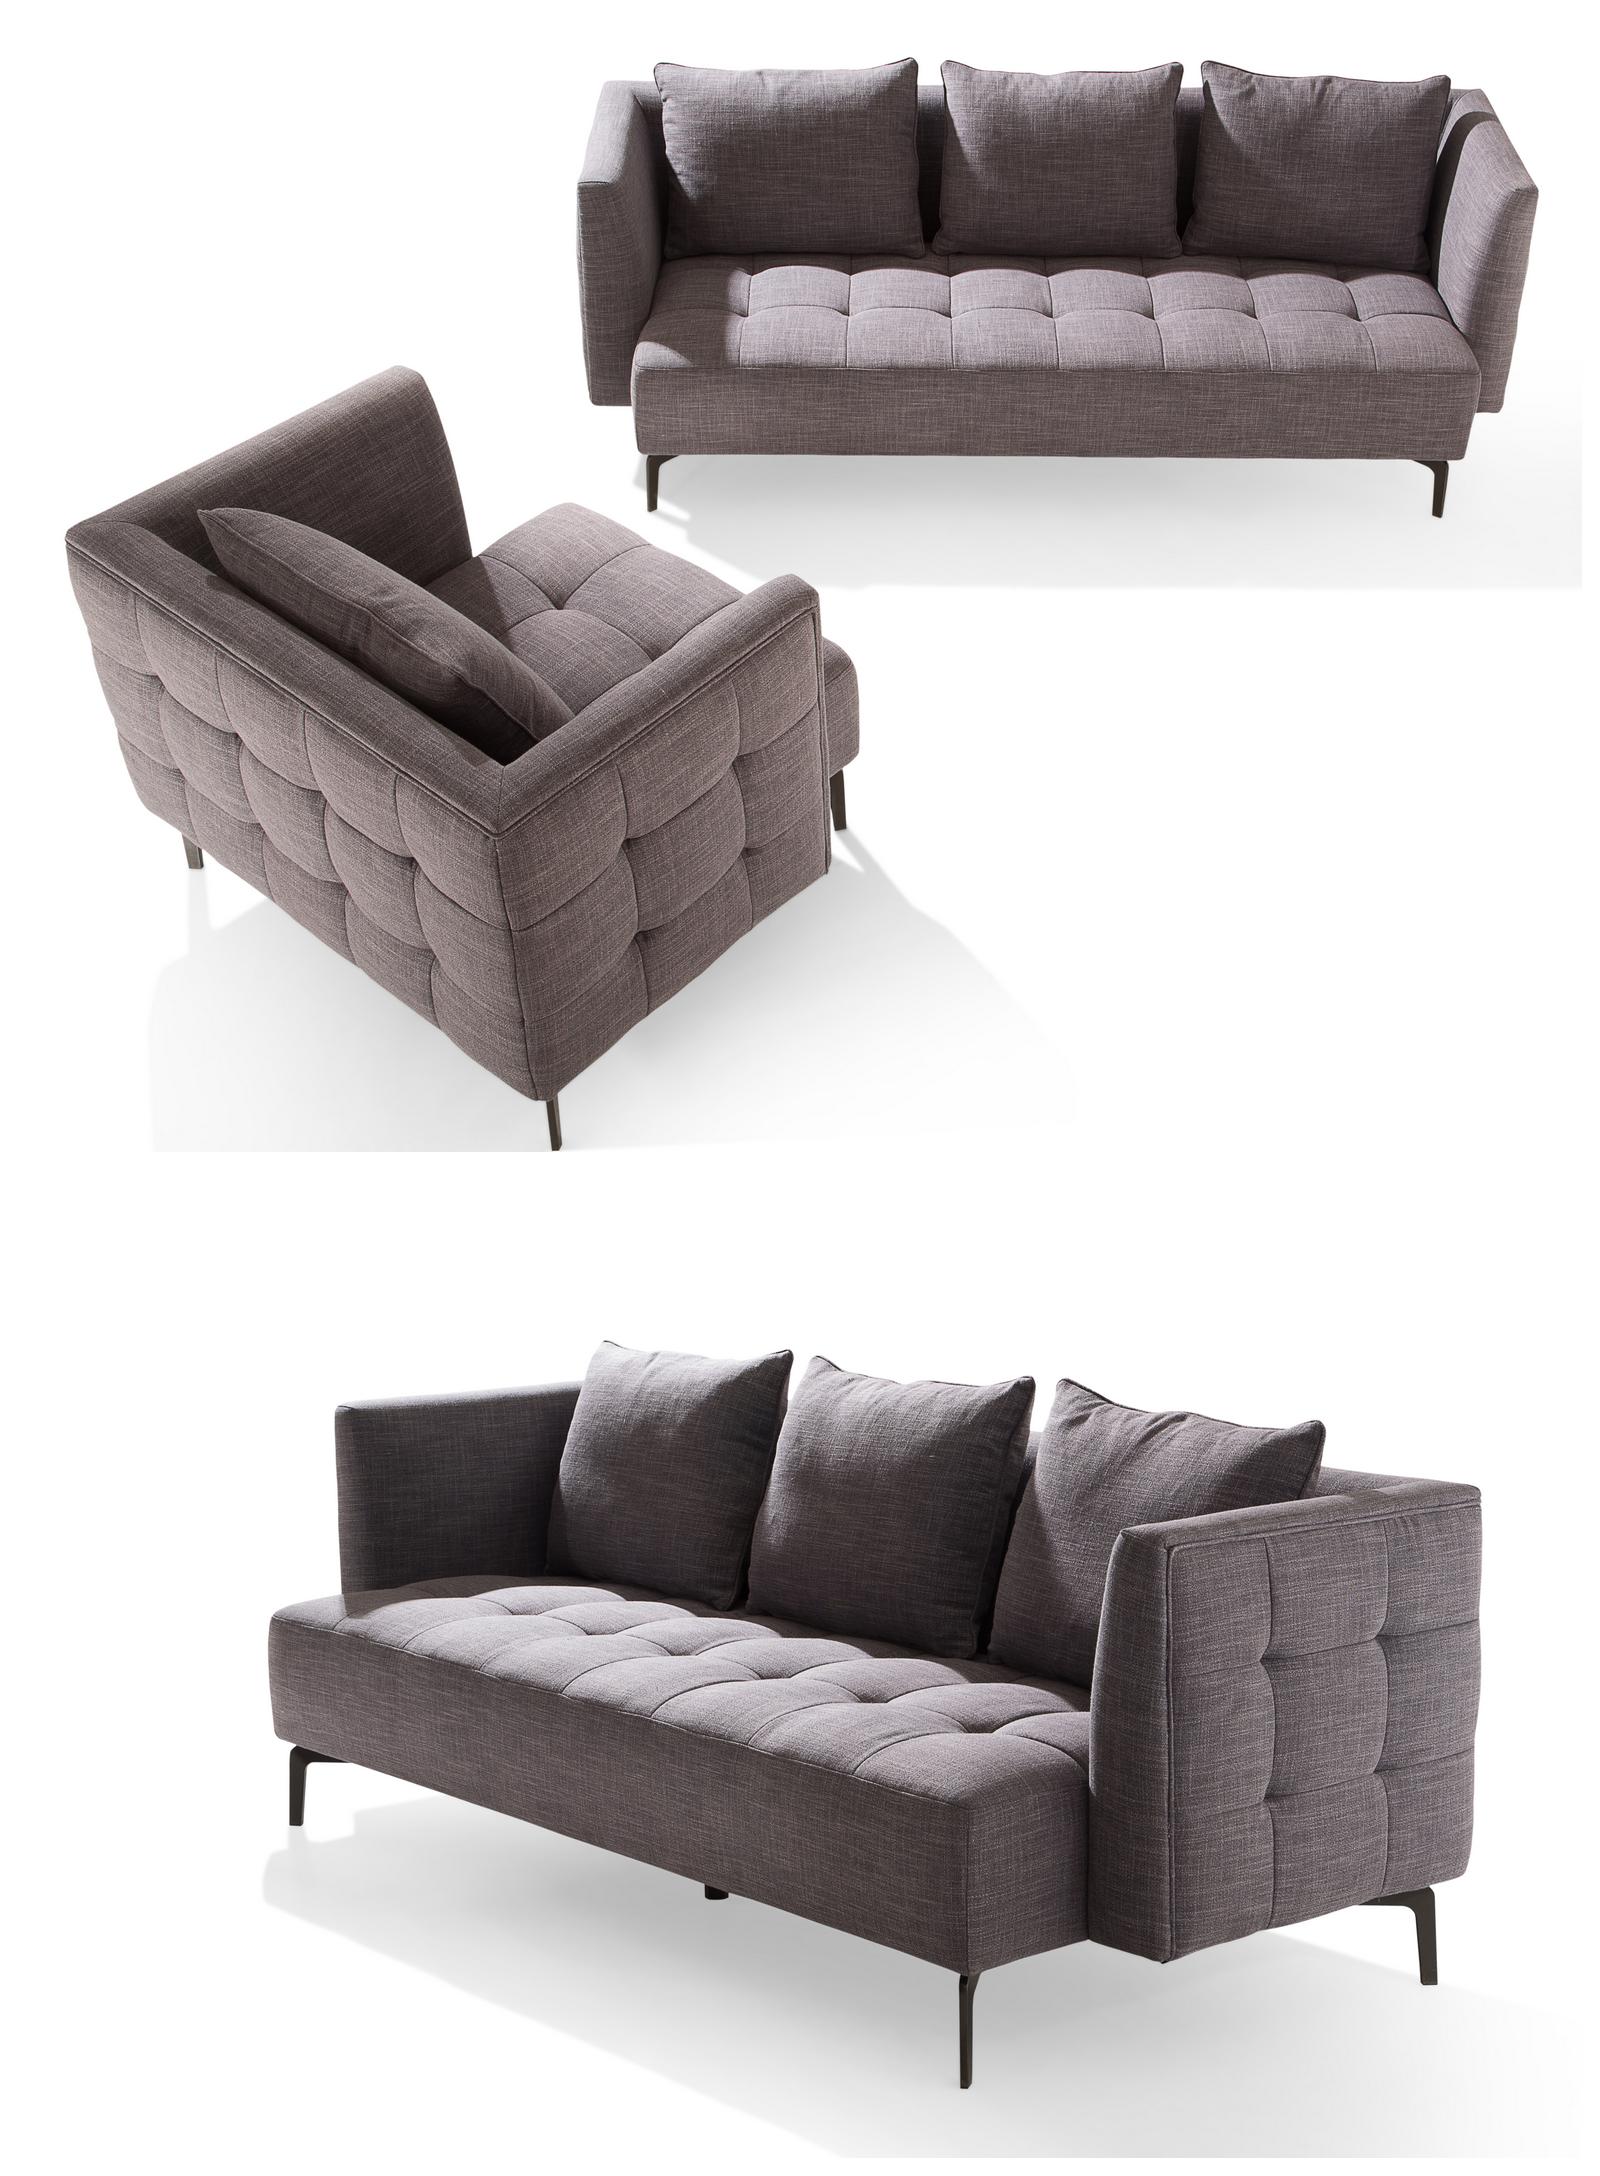 Modernsofa In 2019 Furniture Modern Sofa Designs Modern Sofa